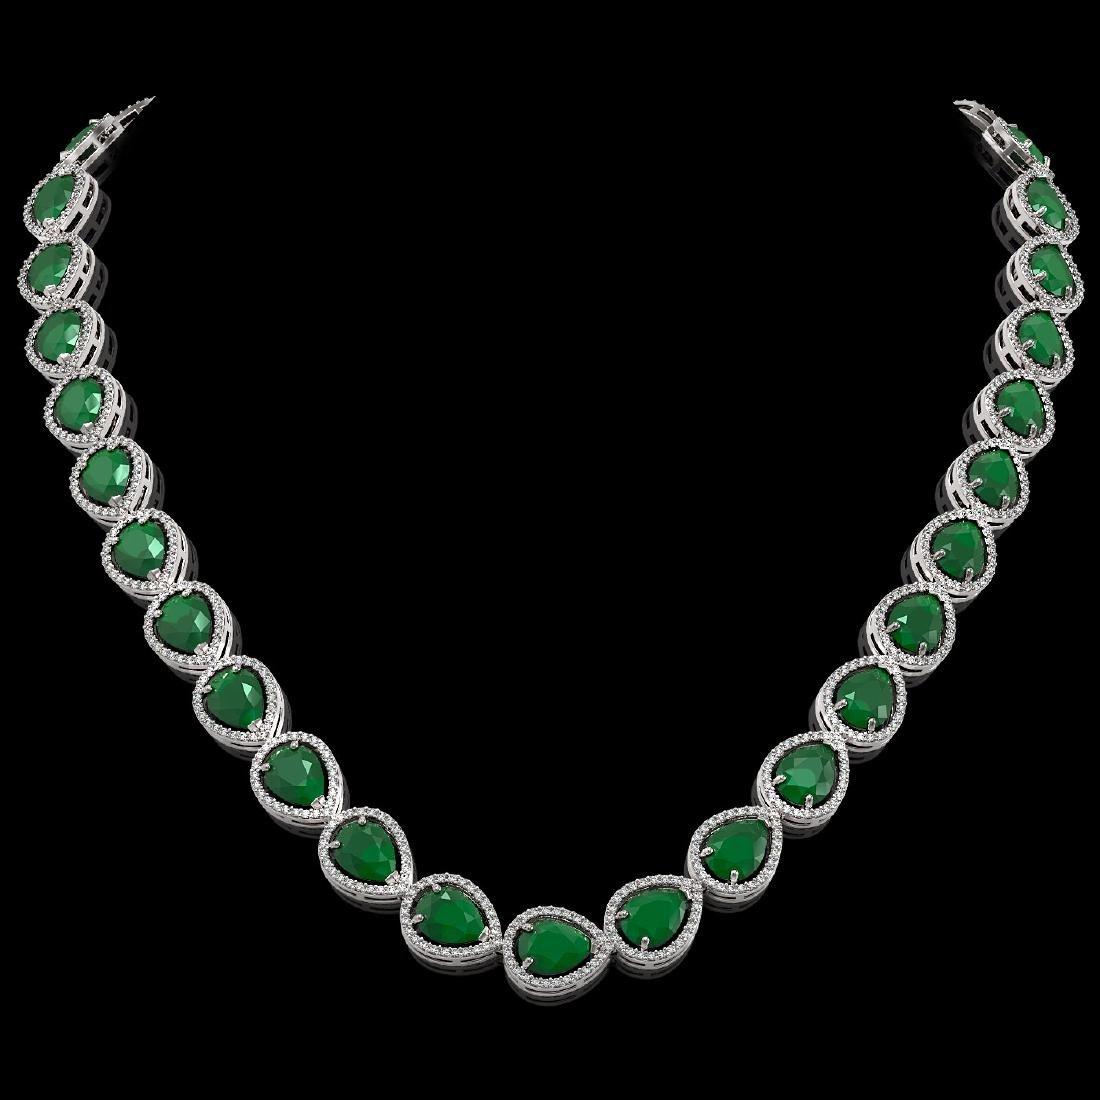 64.01 CTW Emerald & Diamond Halo Necklace 10K White